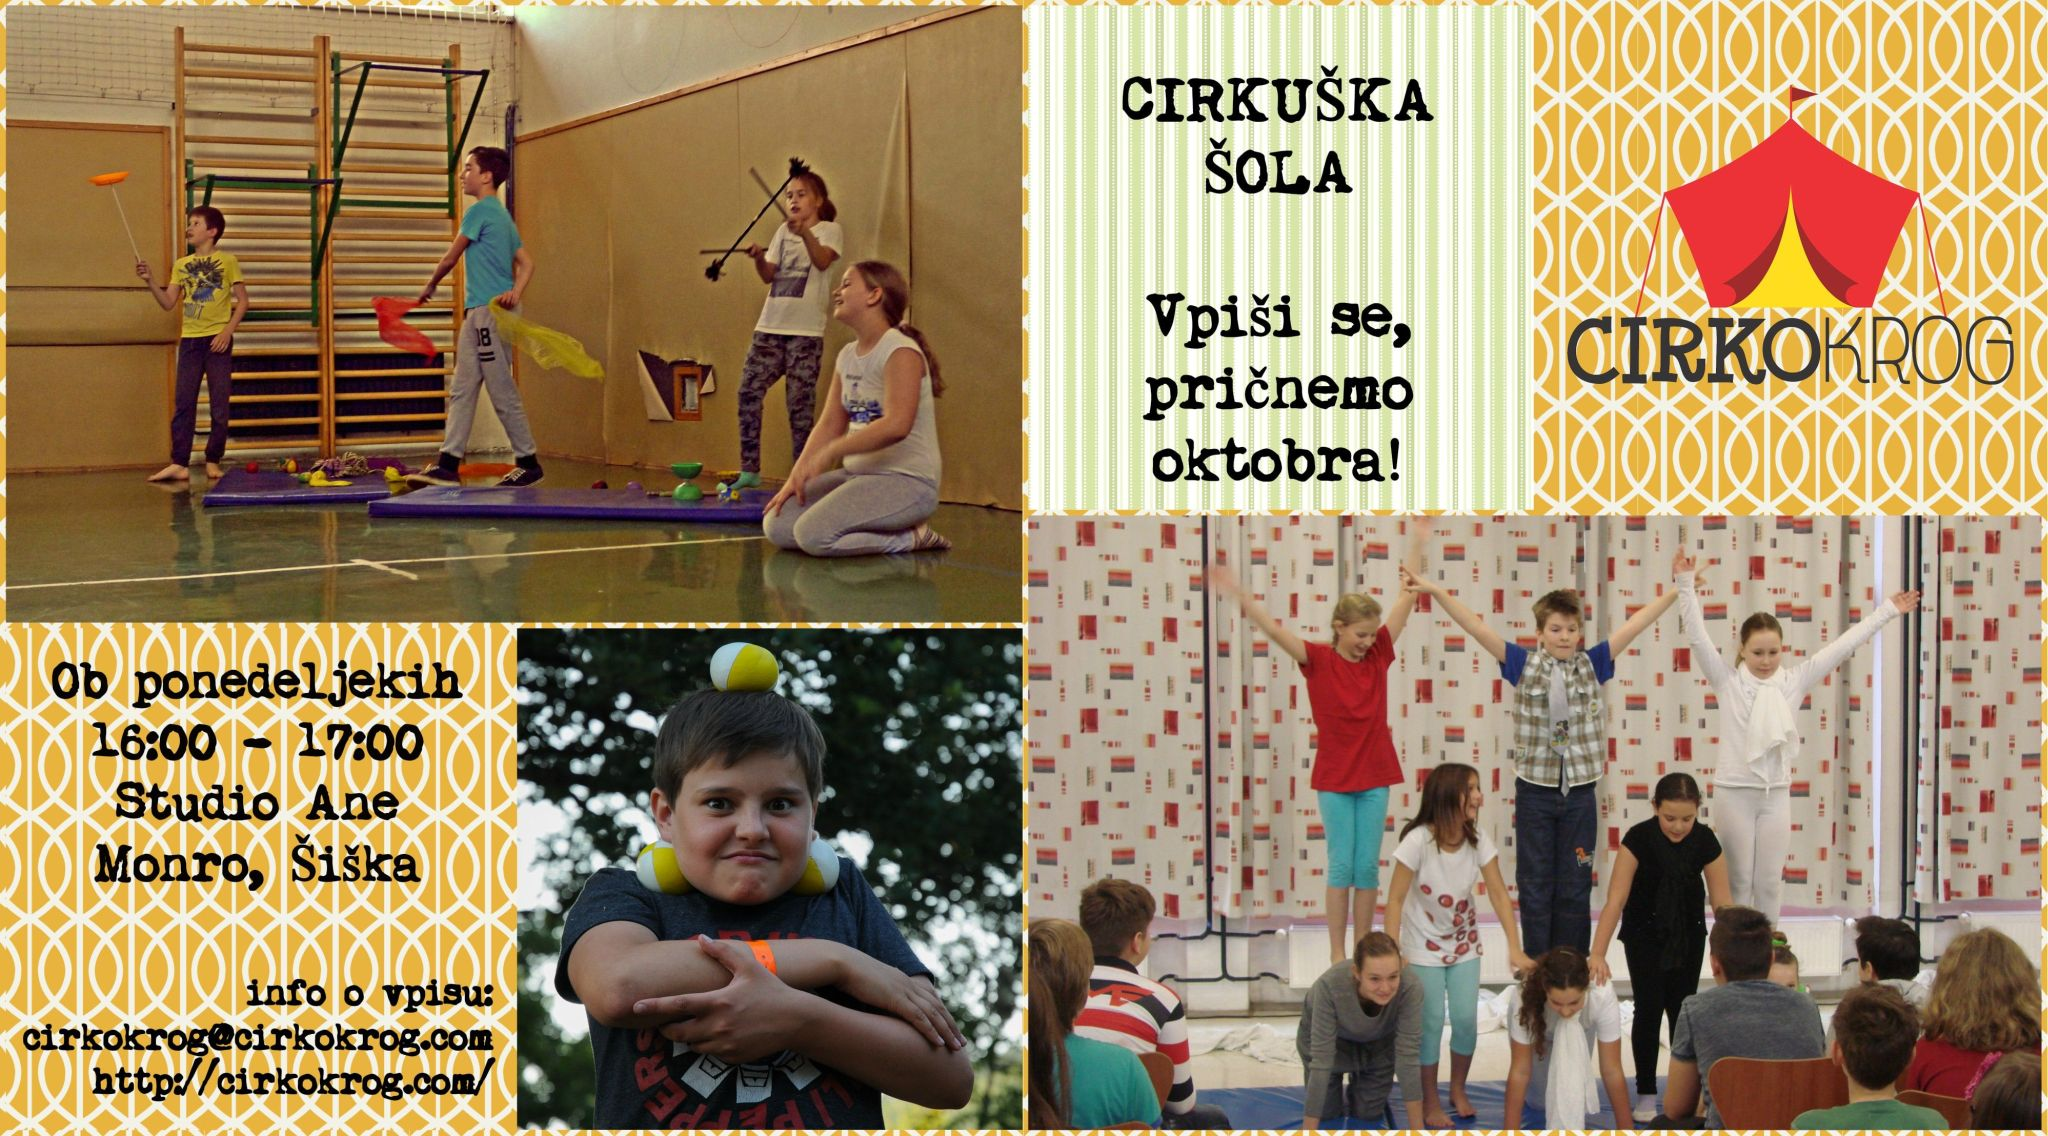 cirkuska-sola